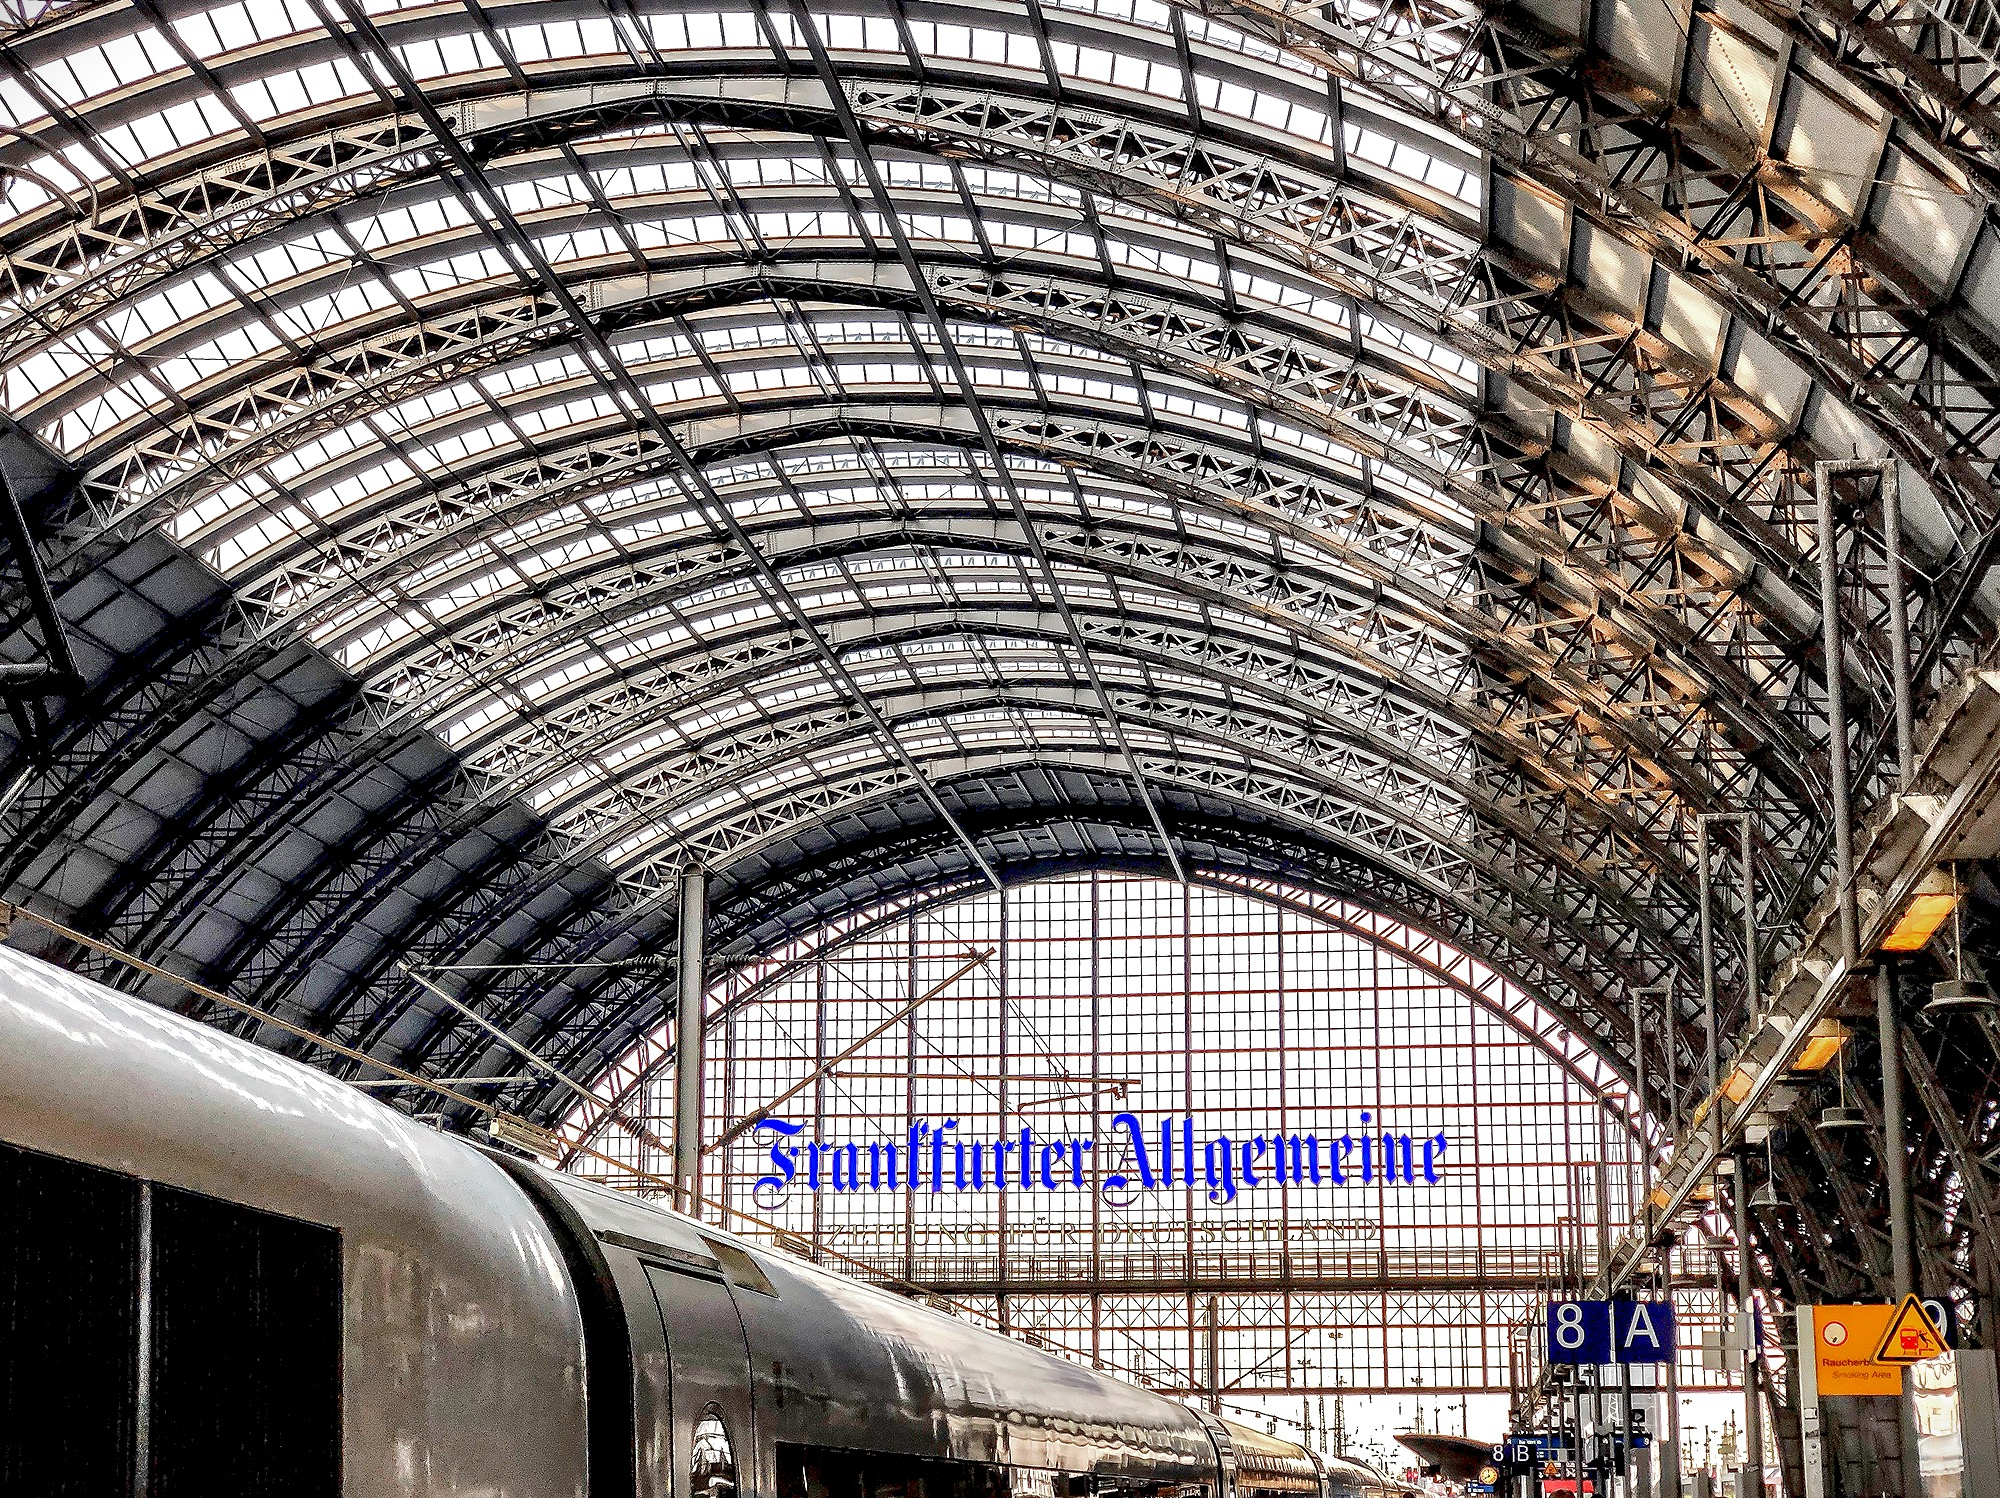 Frankfurt Central Station, Germany